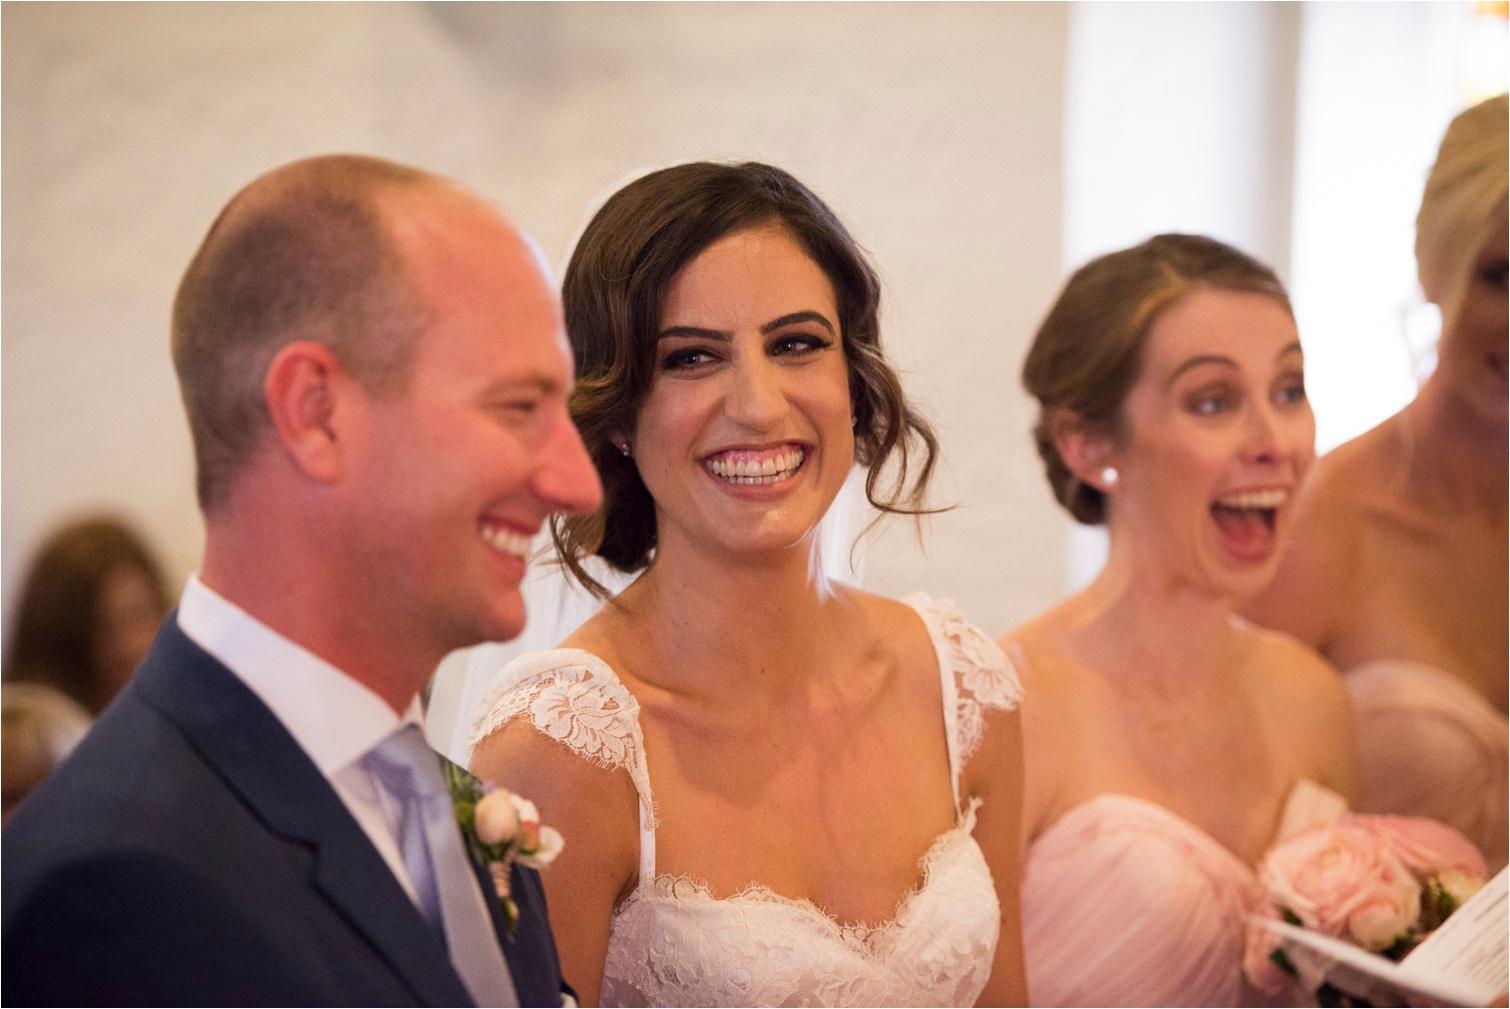 Nicole&Carlie_Watsons_Bay_Hotel_Wedding_by_Gold_Coast_Photographers-The_Follans15.jpg